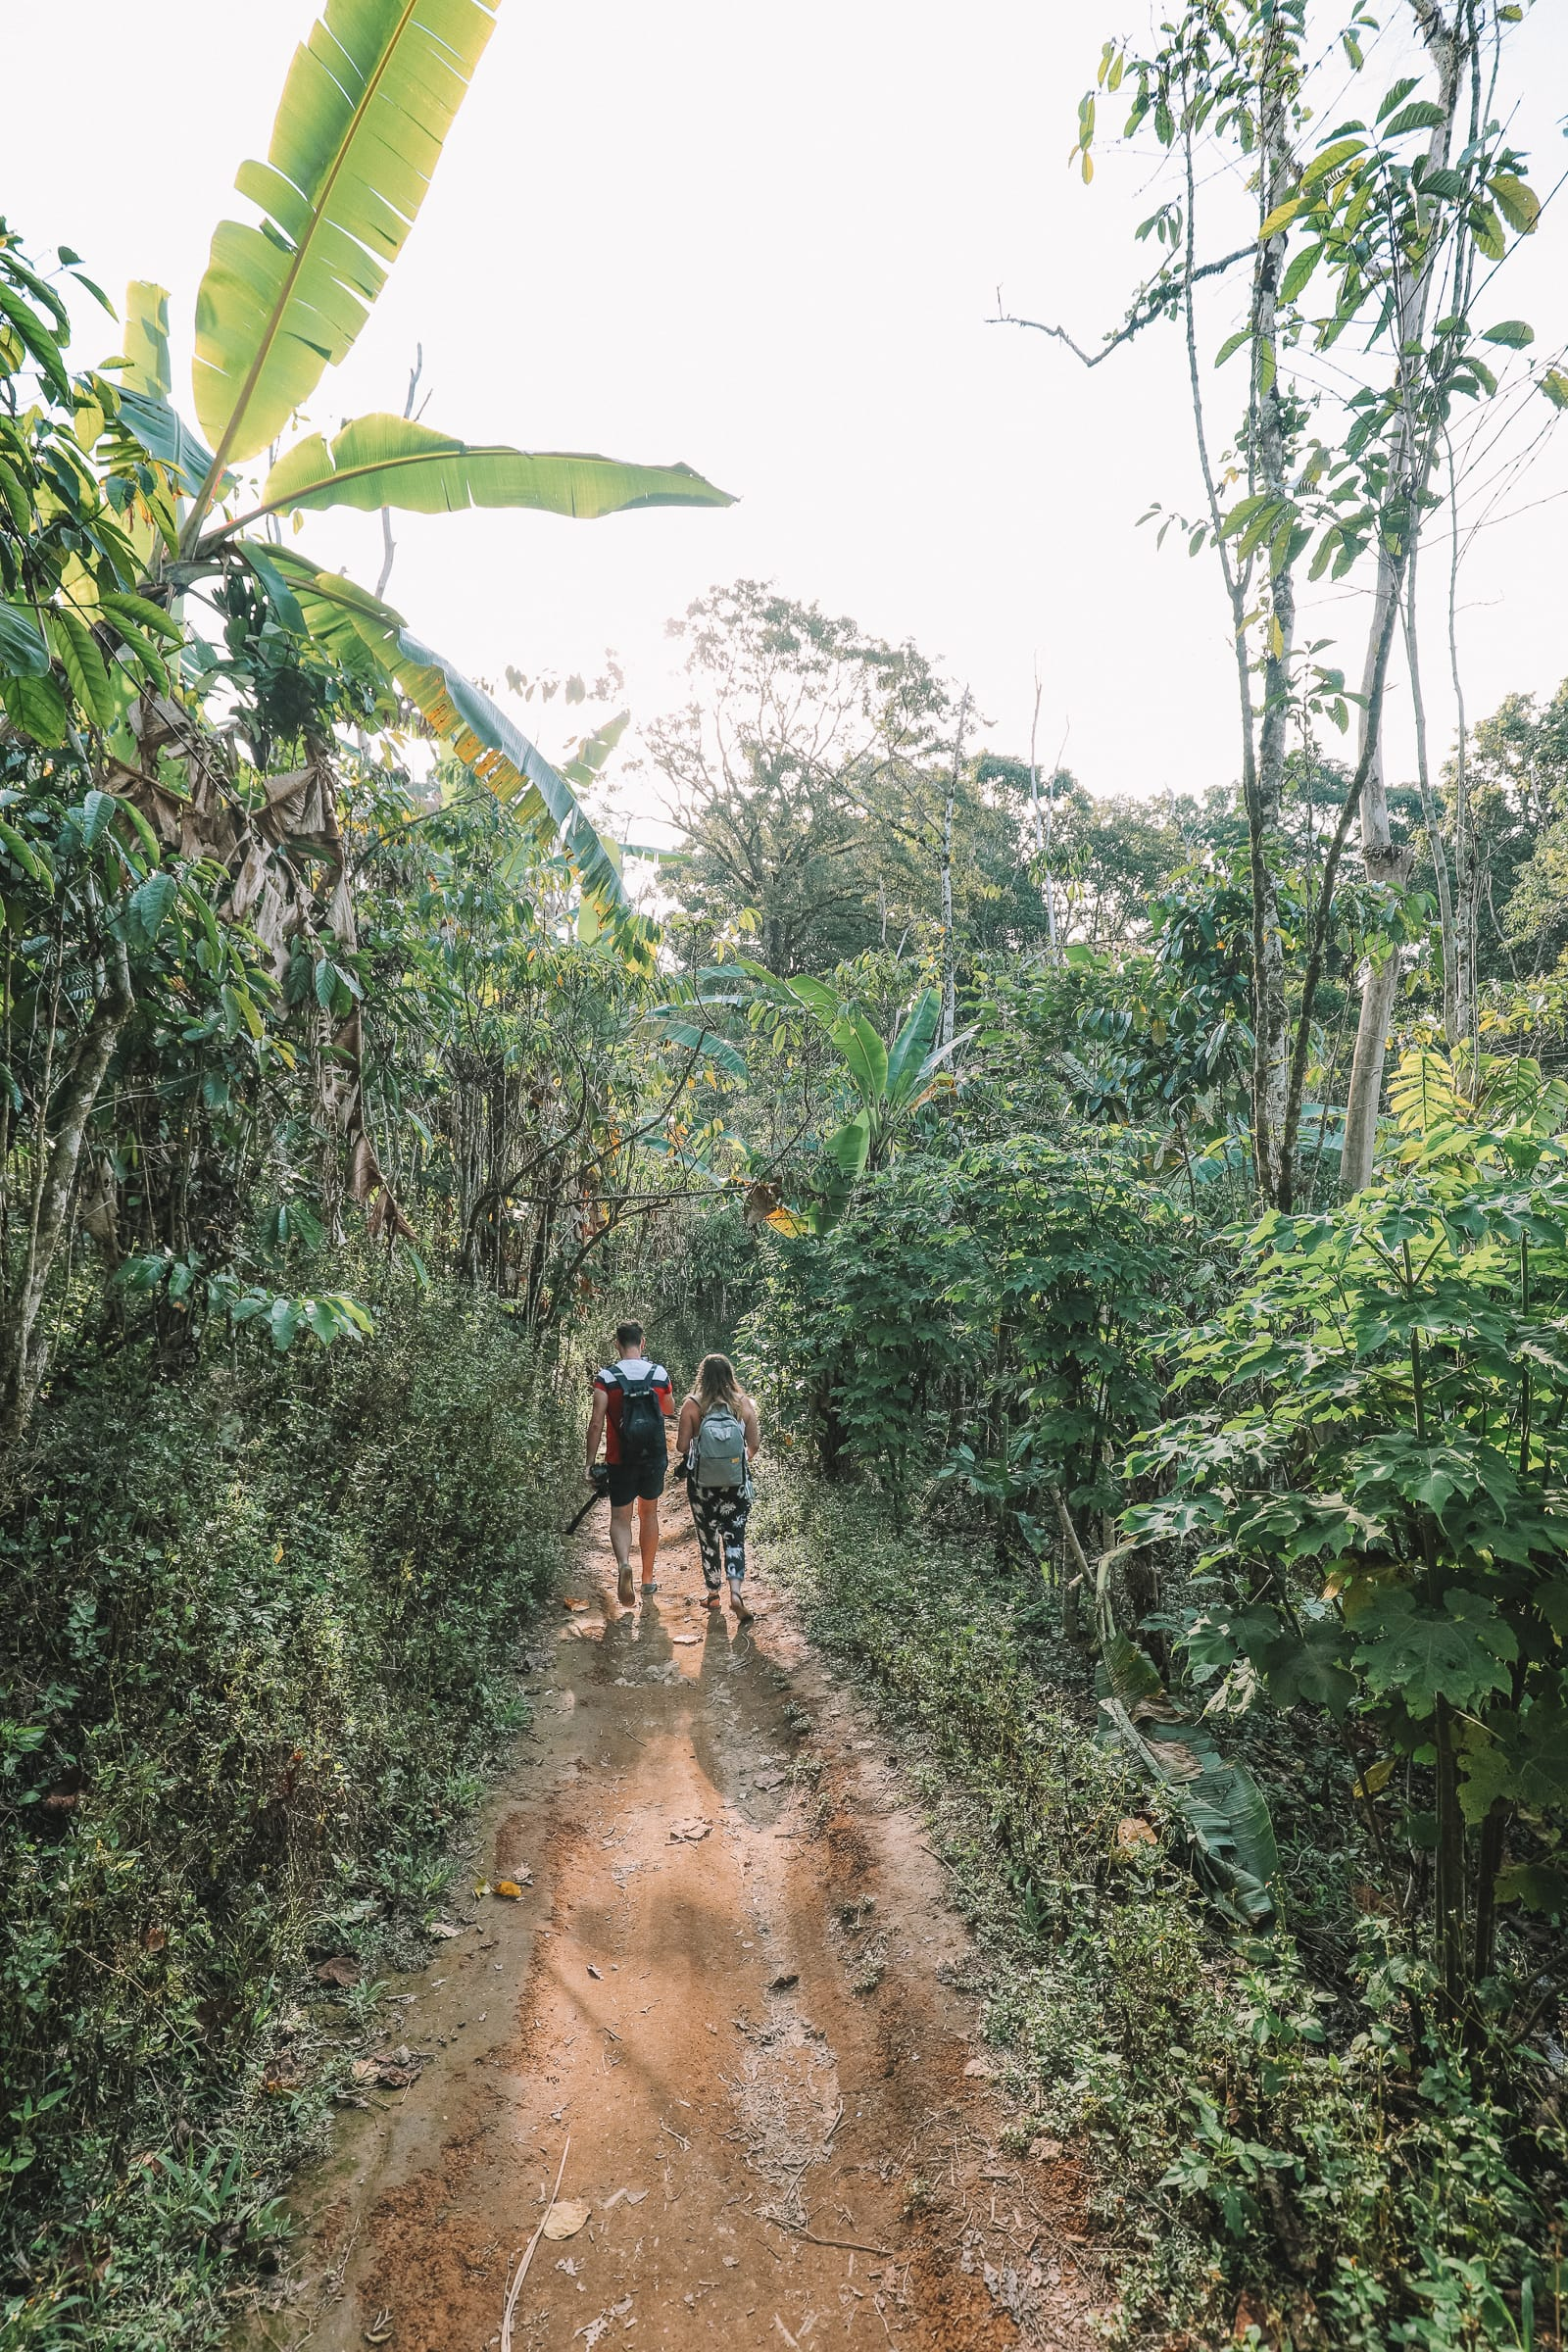 The Amazing Banyumala Twin Waterfalls In The Jungles Of Bali (6)